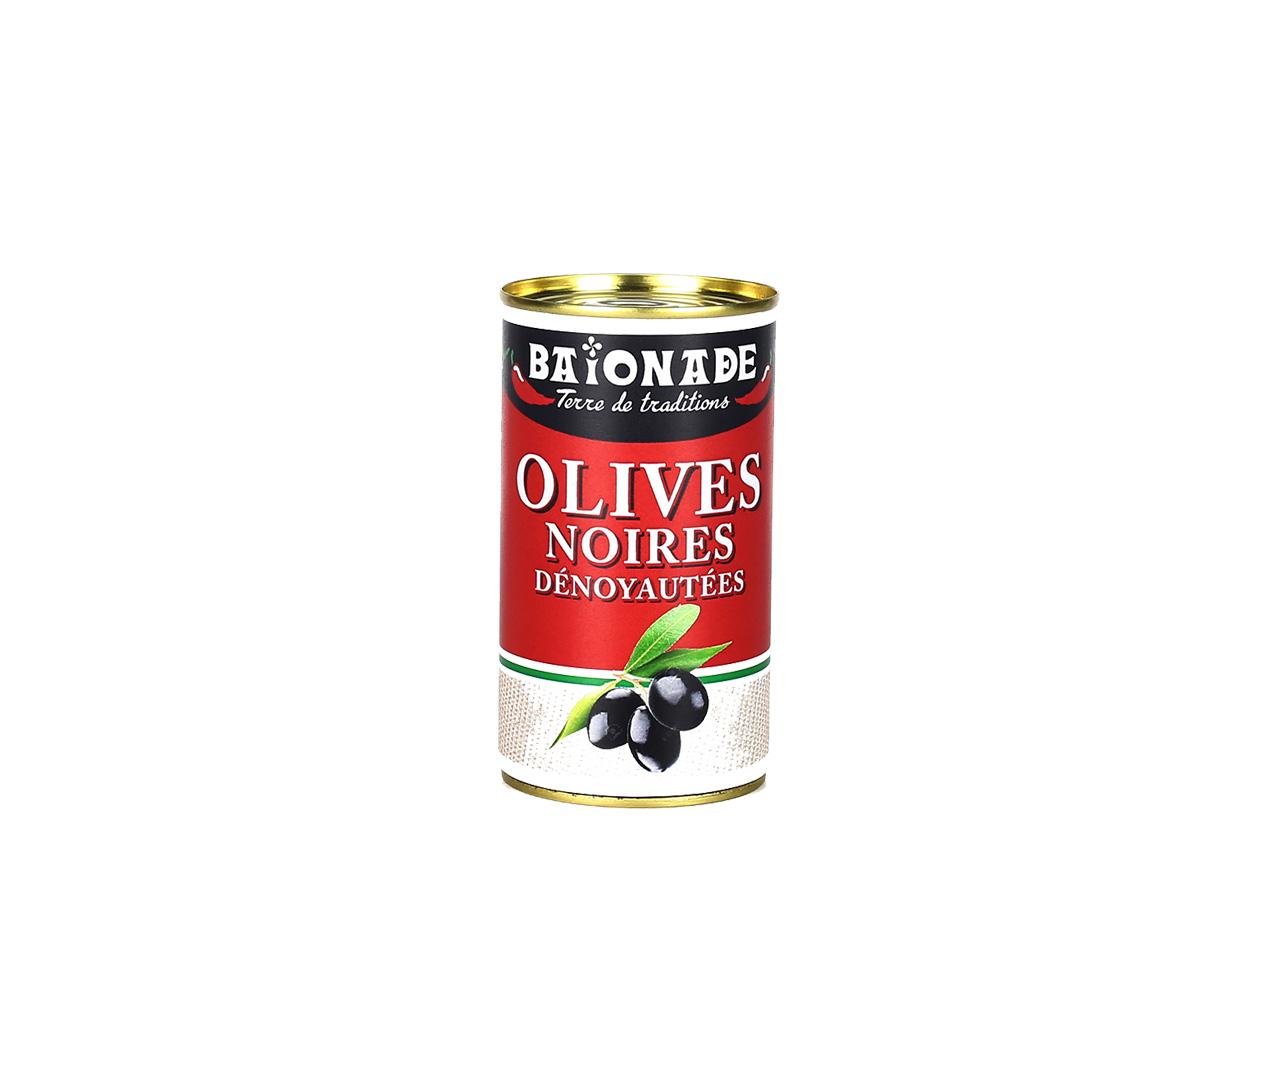 Olives noires dénoyautées Baïonade